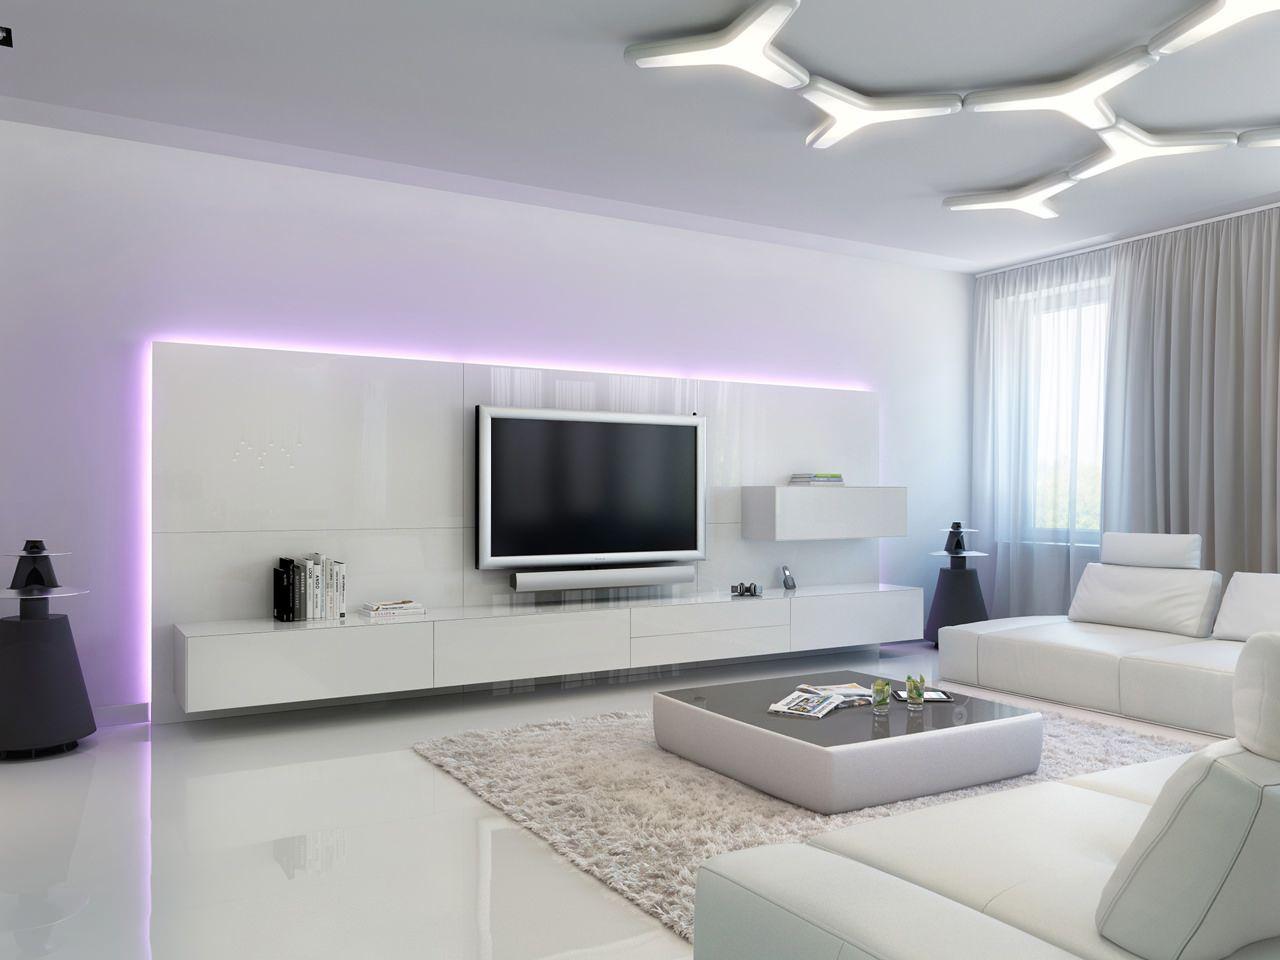 2 White Entertainment Wall Jpg 1 280 960 Pixel Futuristic Interior False Ceiling Design